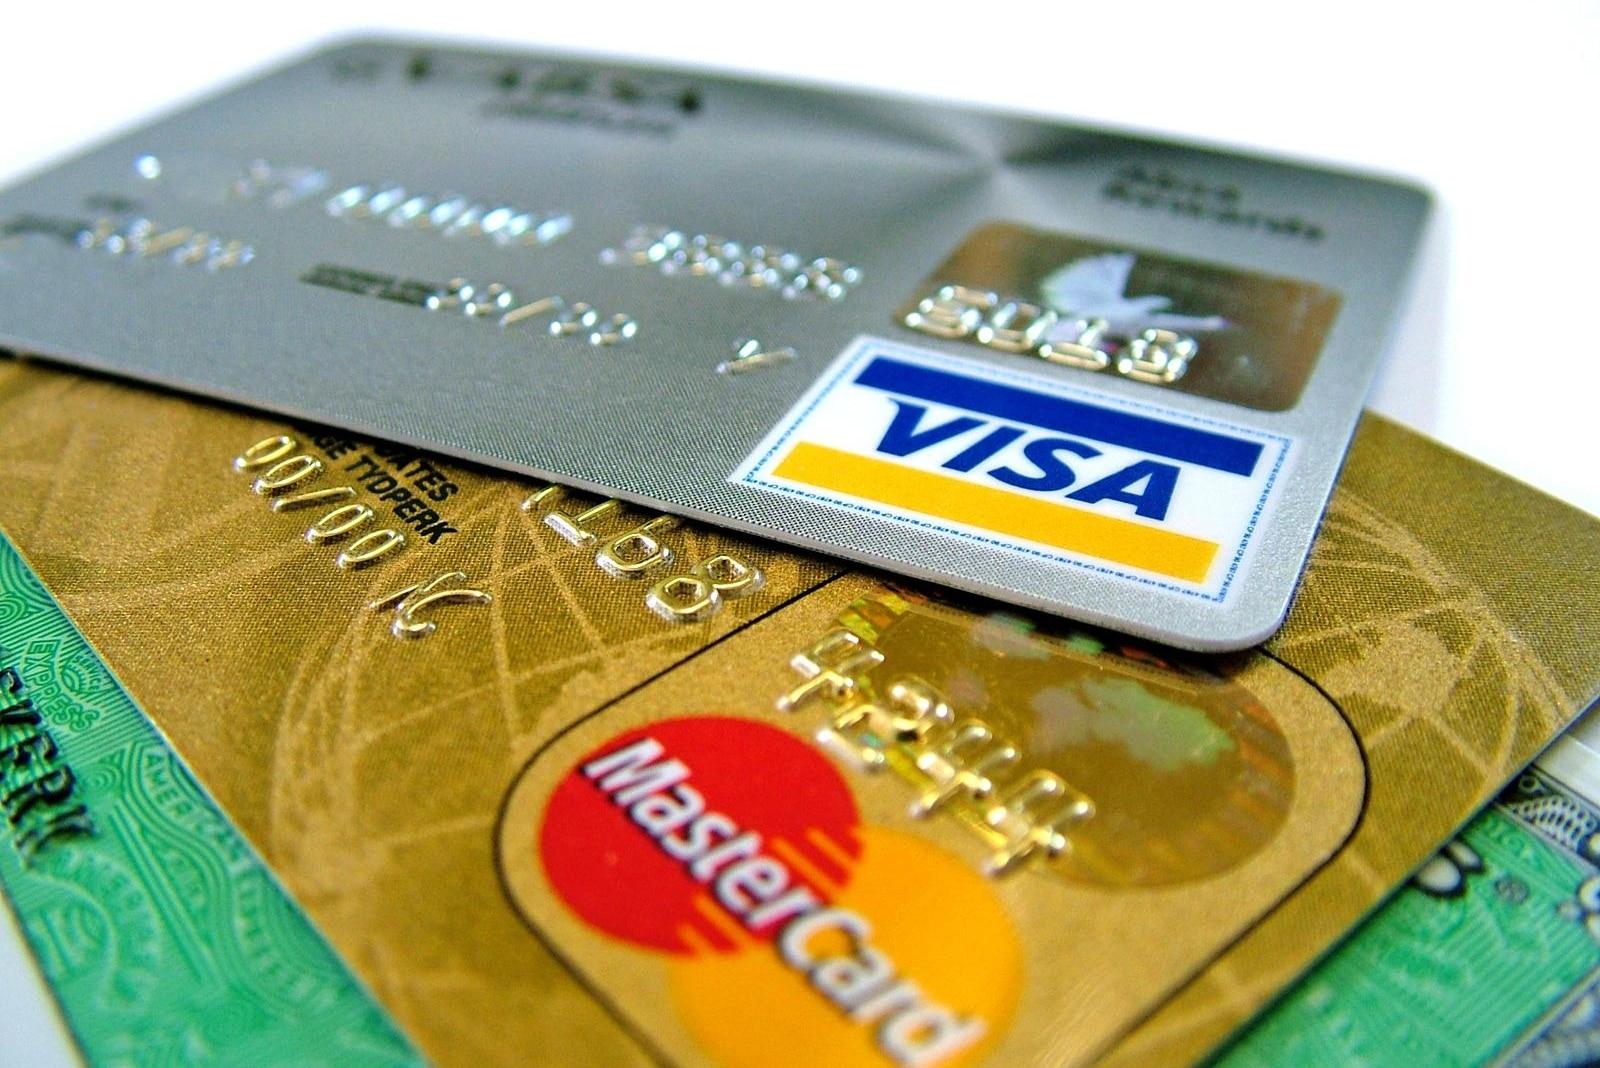 Carte Bancaire Prepayee Haut De Gamme.Carte De Debit Carte De Credit Carte Prepayee Les